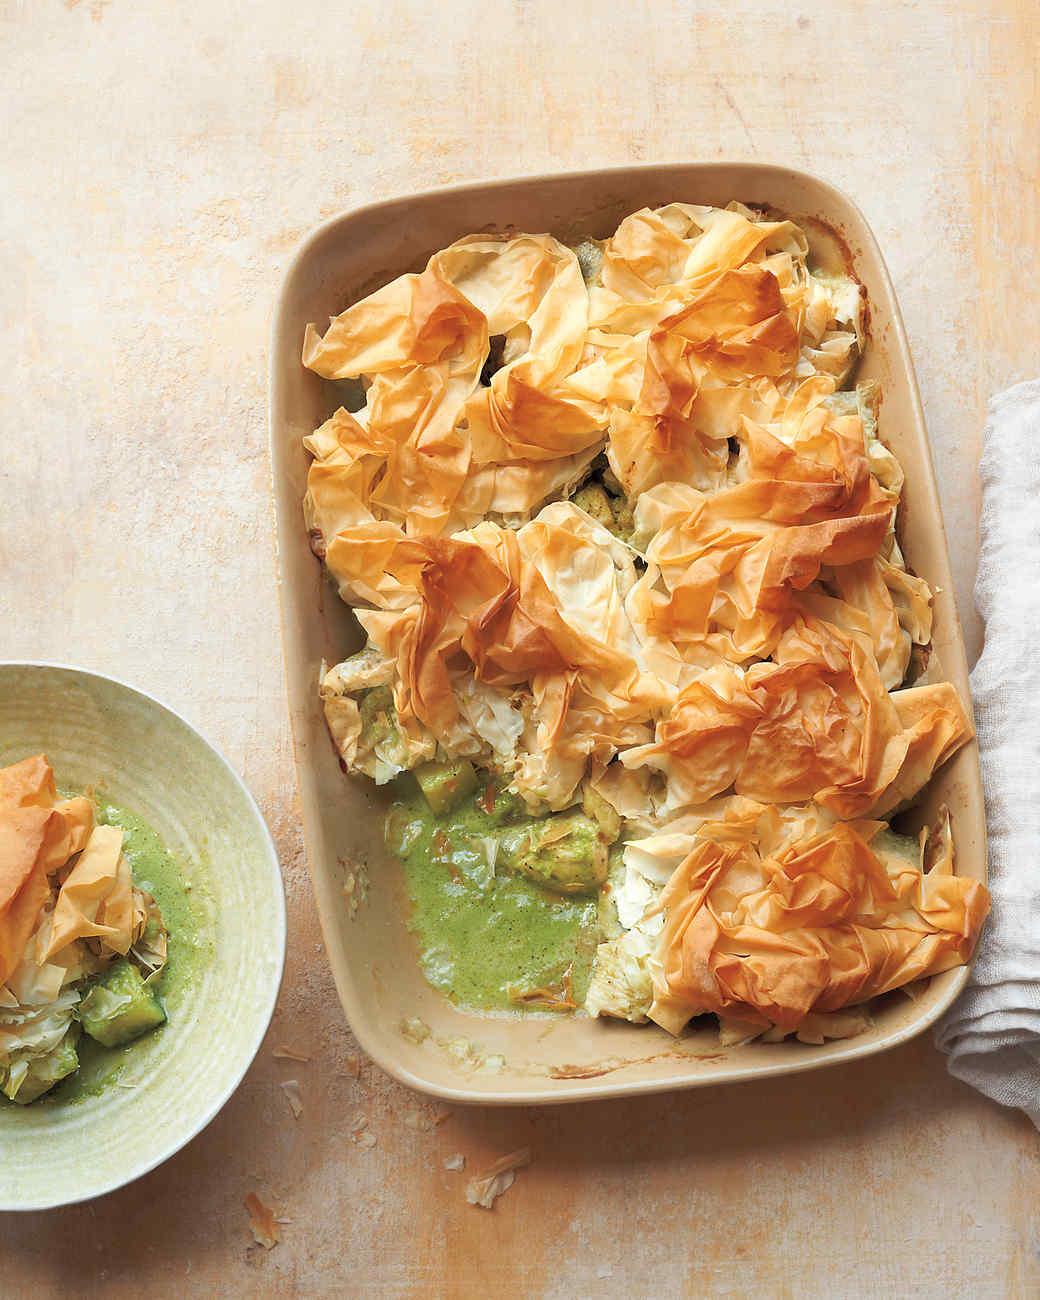 savory-pies-green-curry-msl1011mld107671.jpg